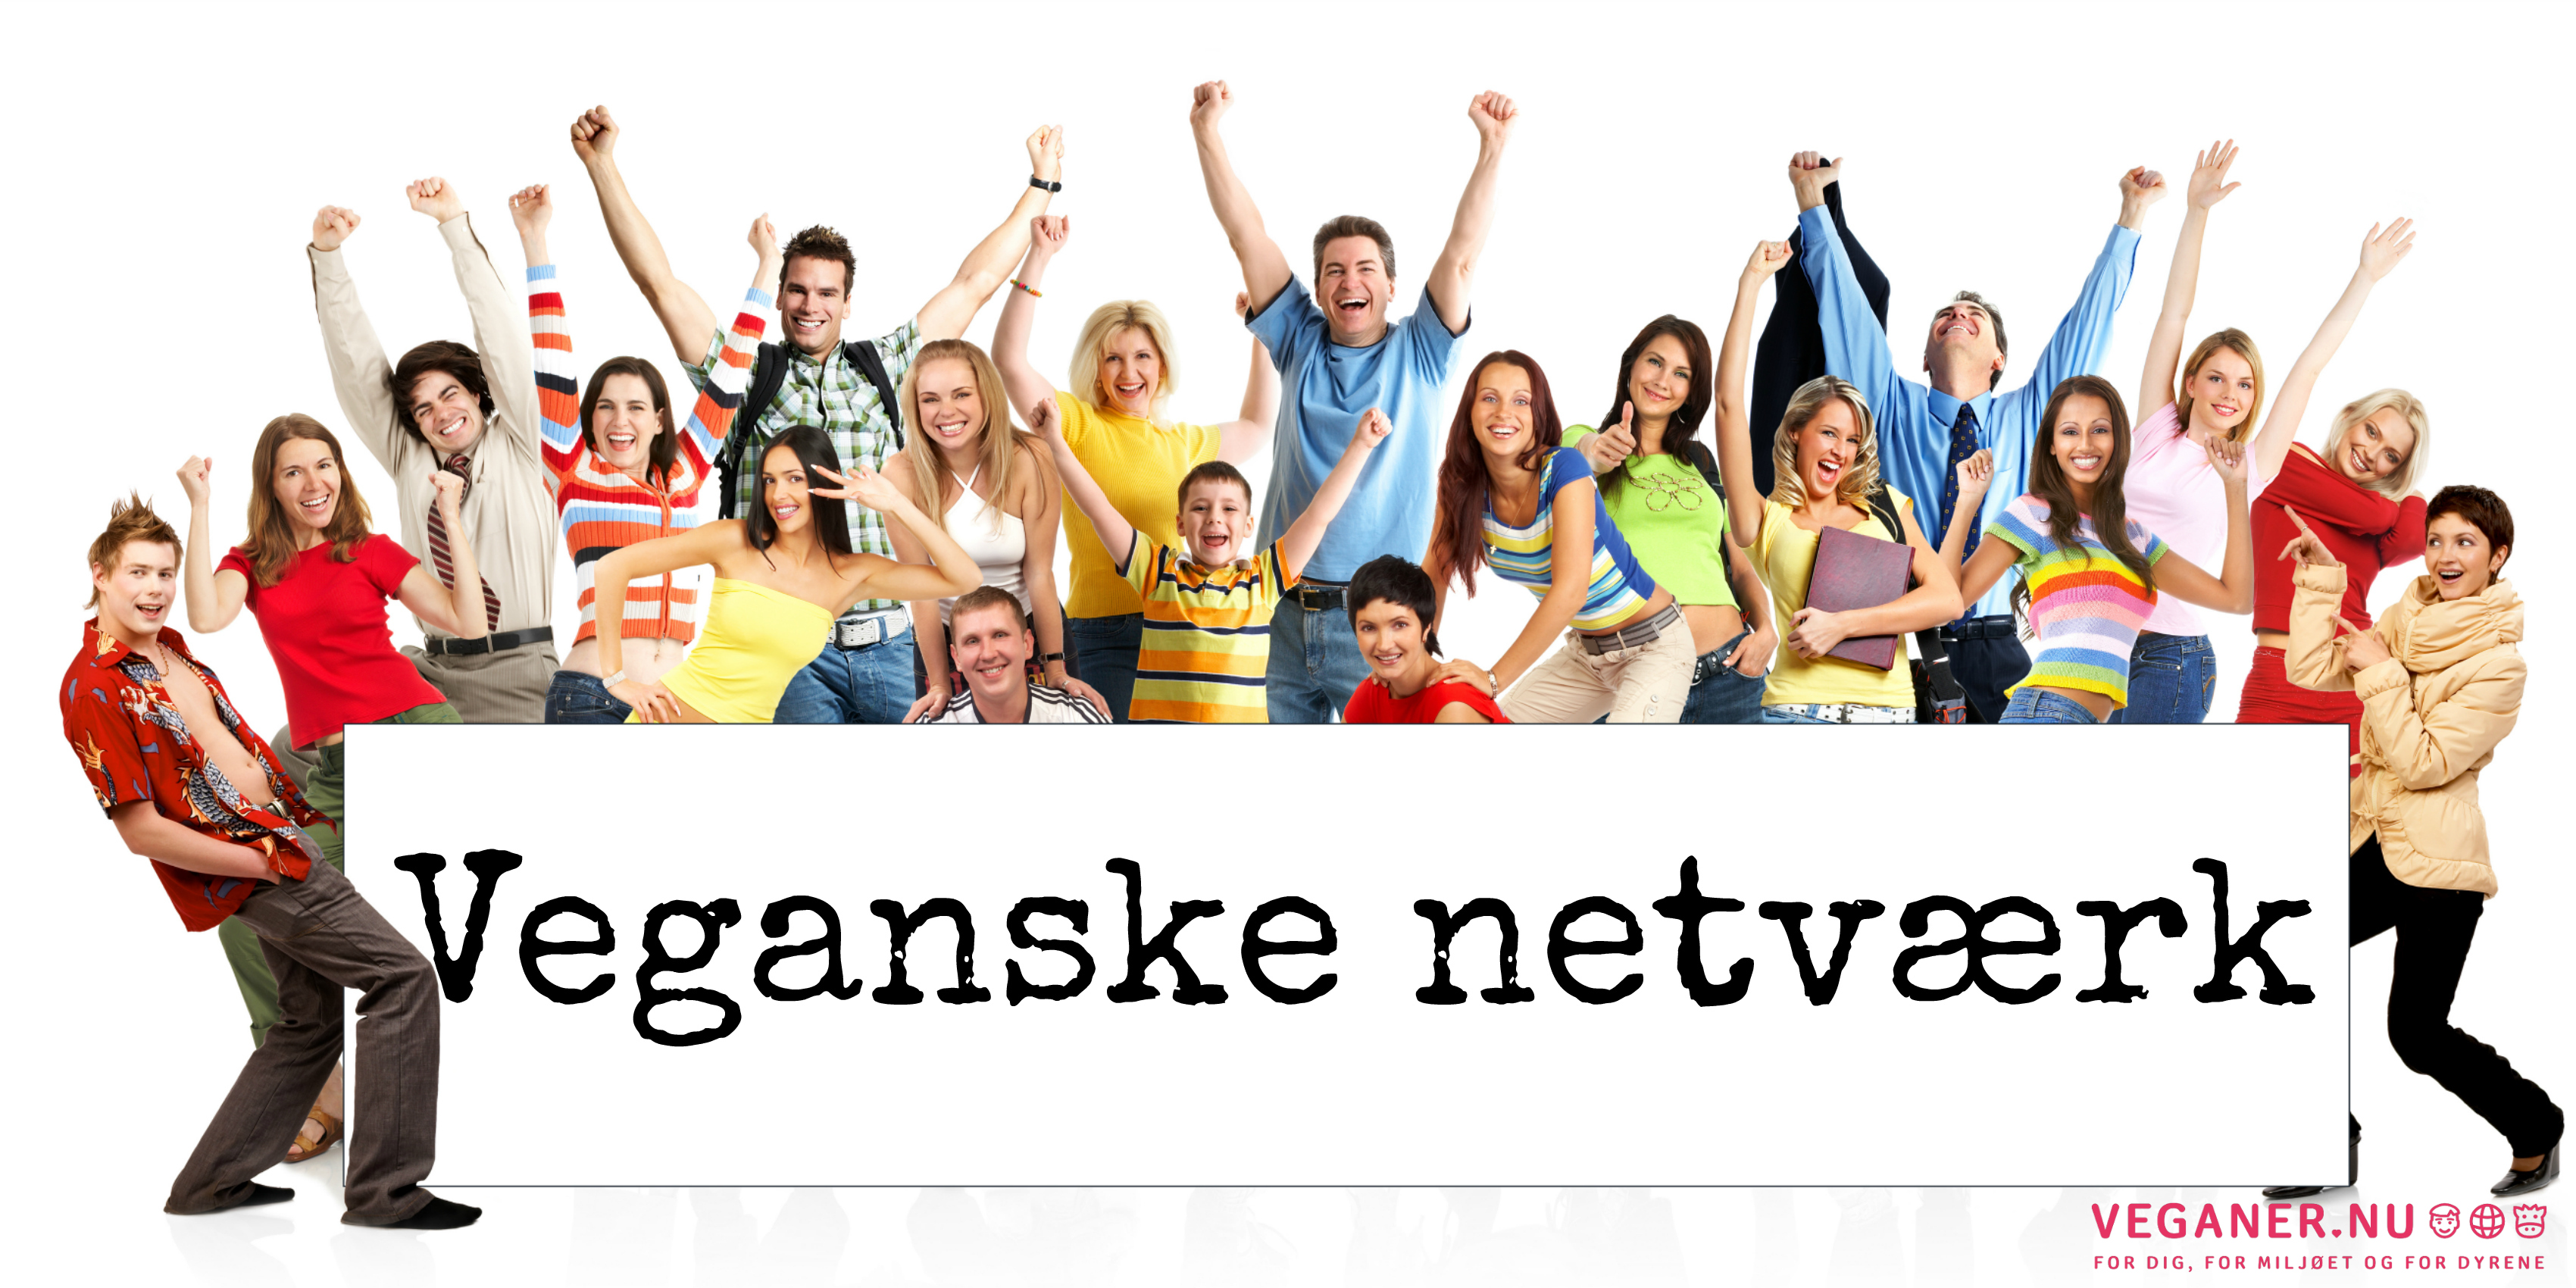 Veganske netværk